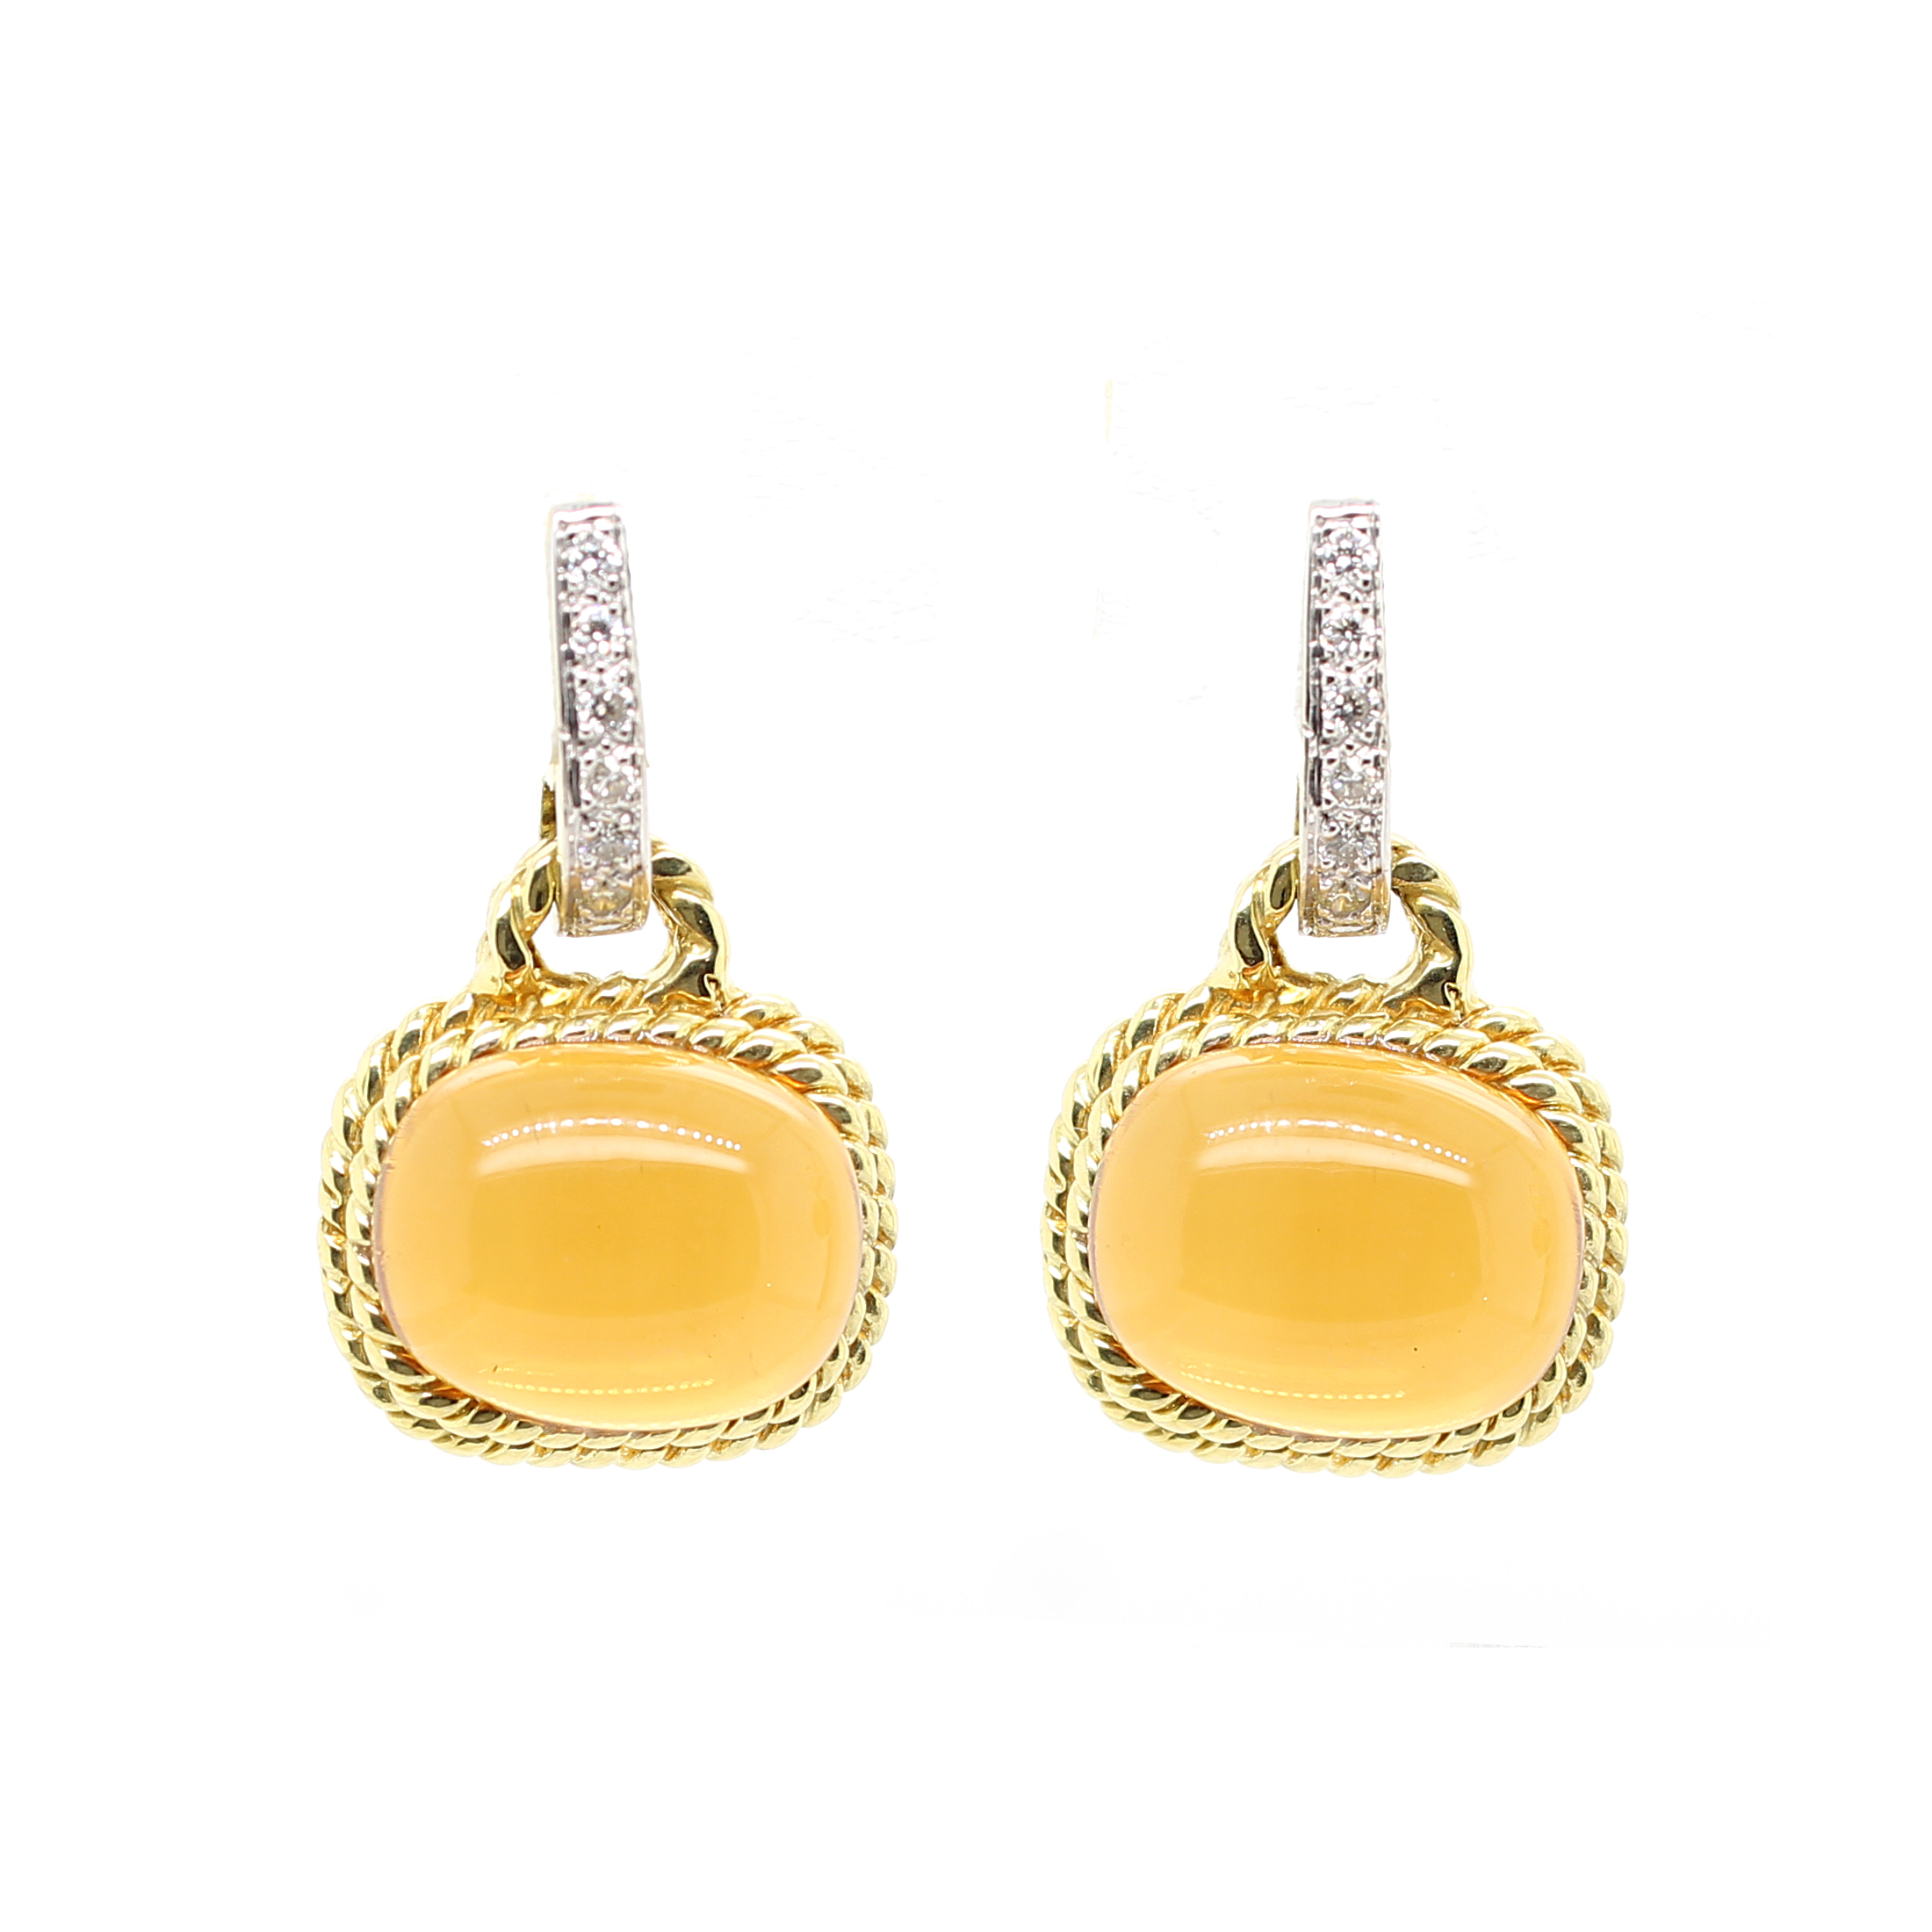 18 Karat Yellow Gold Cabochon Citrine and Diamond Earrings